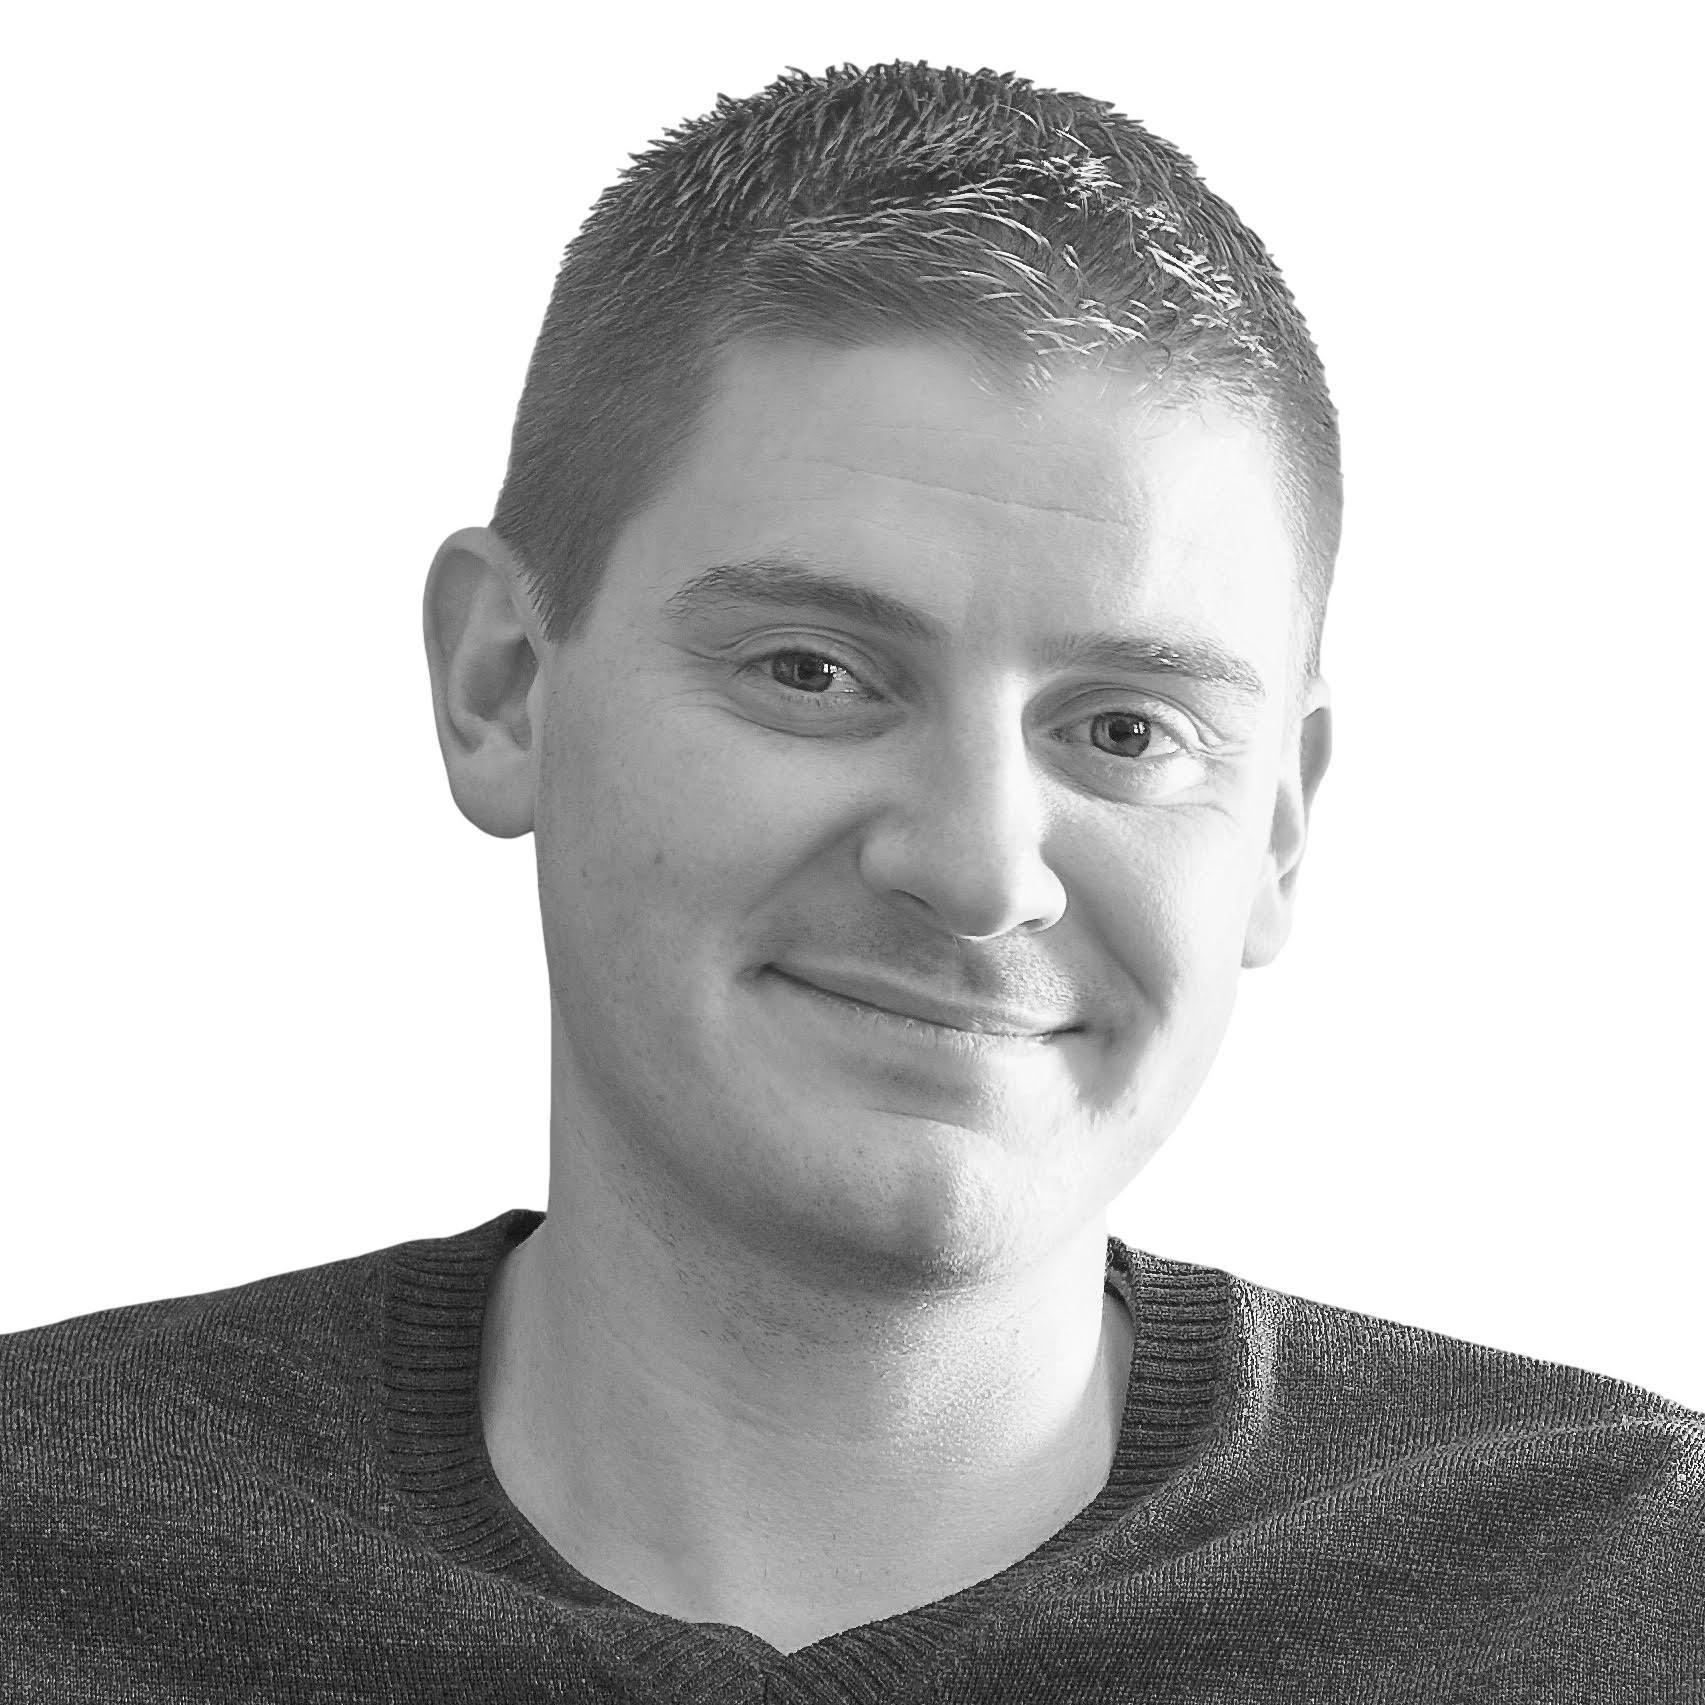 Matt-Artz-Headshot